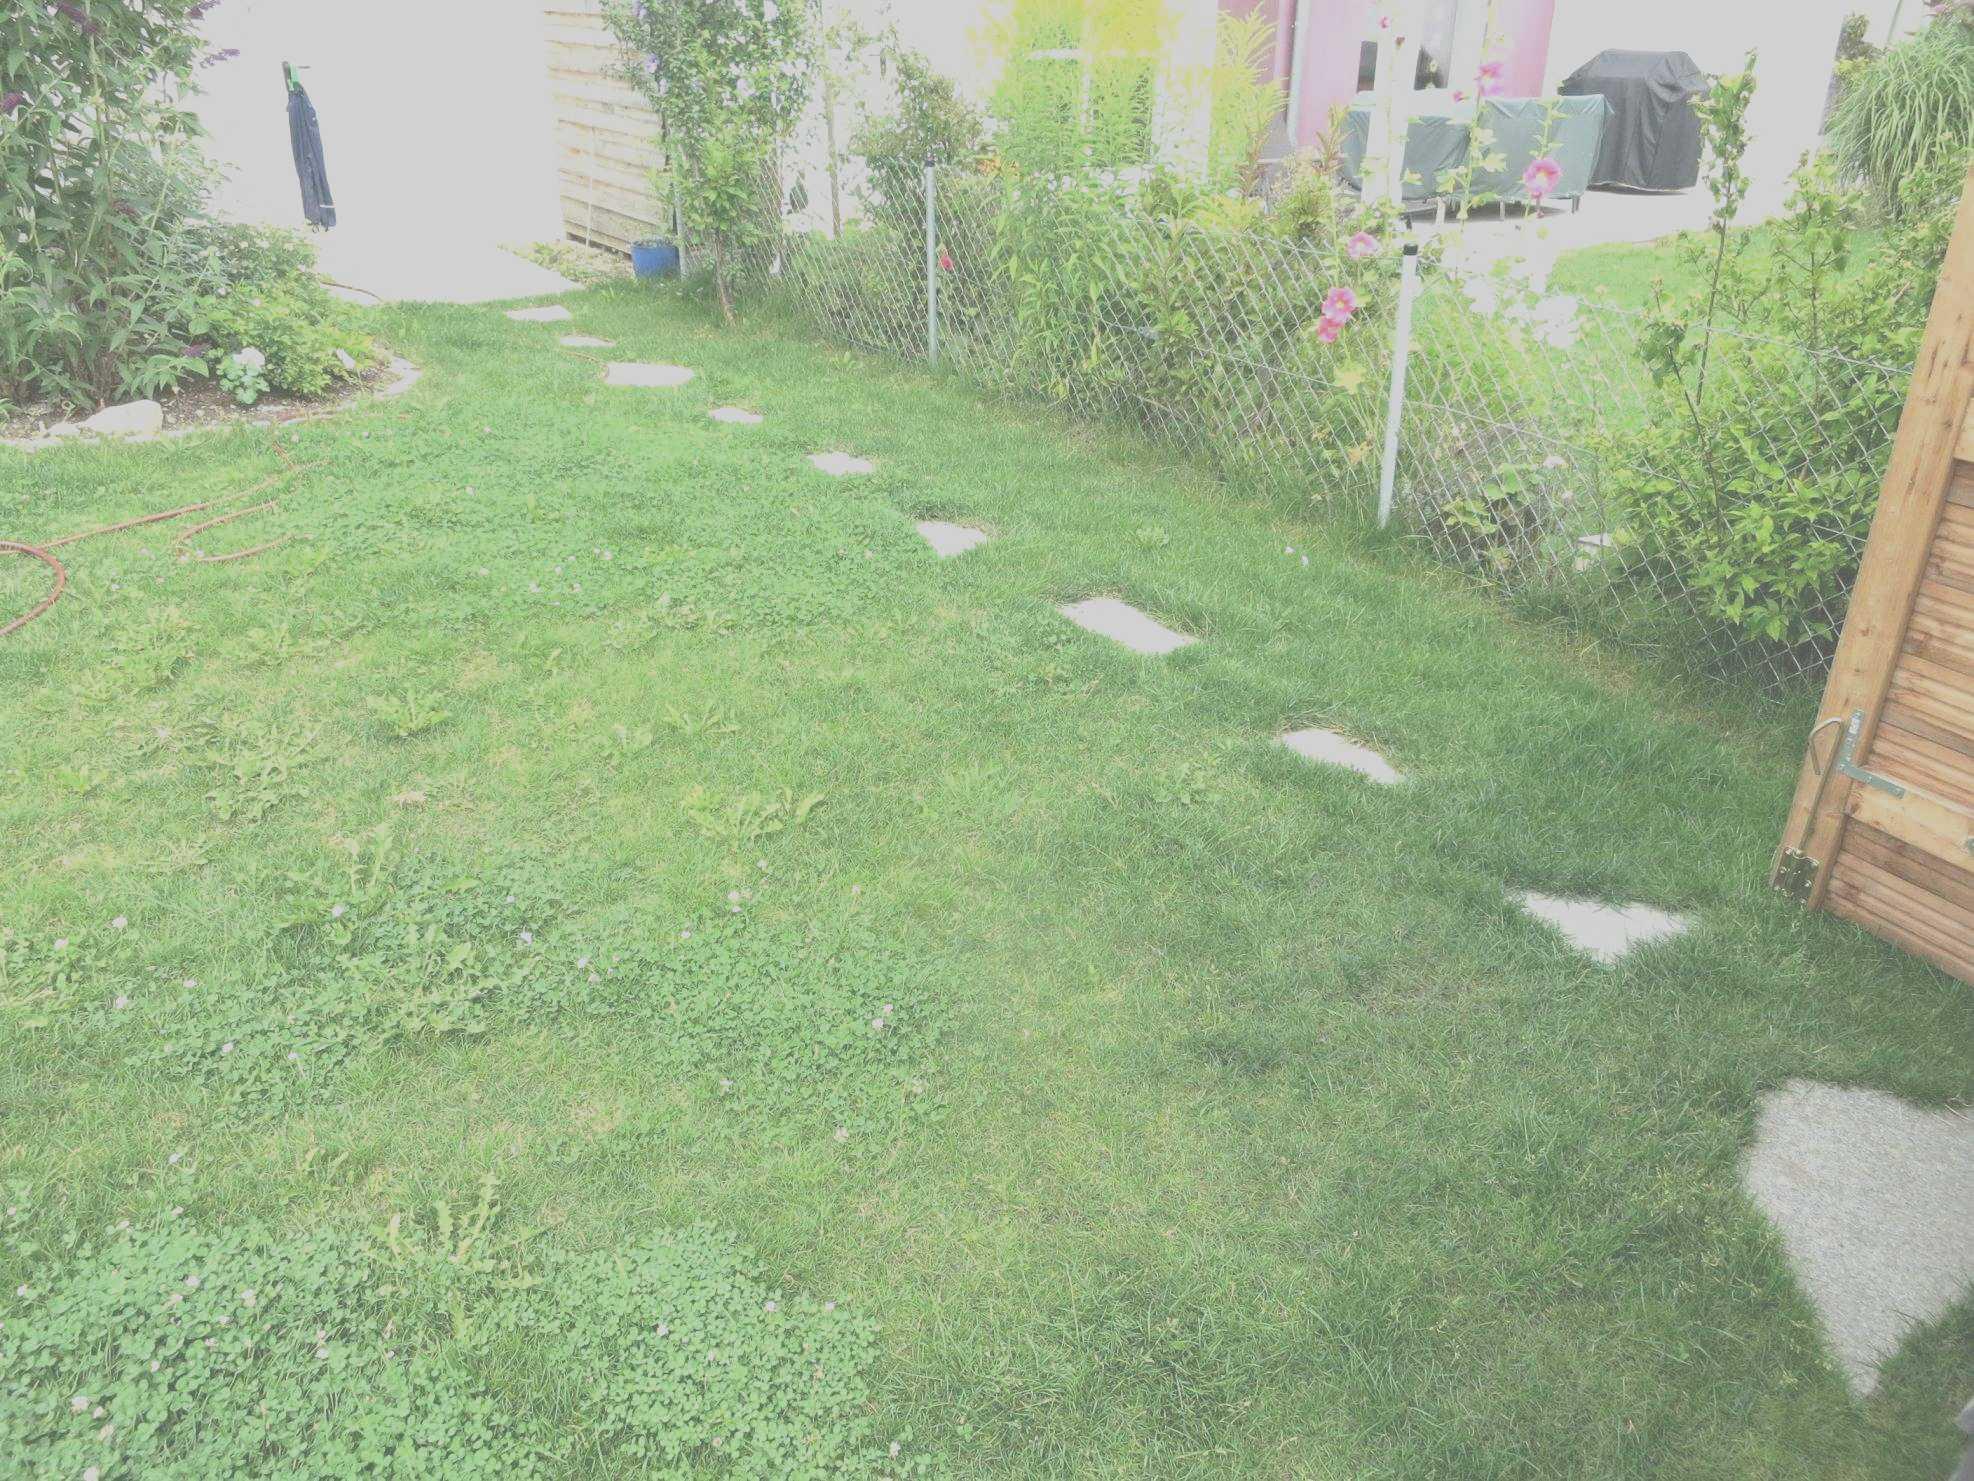 Deko Für Den Garten Selber Machen Inspirierend Alten Garten Neu Anlegen Elegant Garten Neu Anlegen Bilder